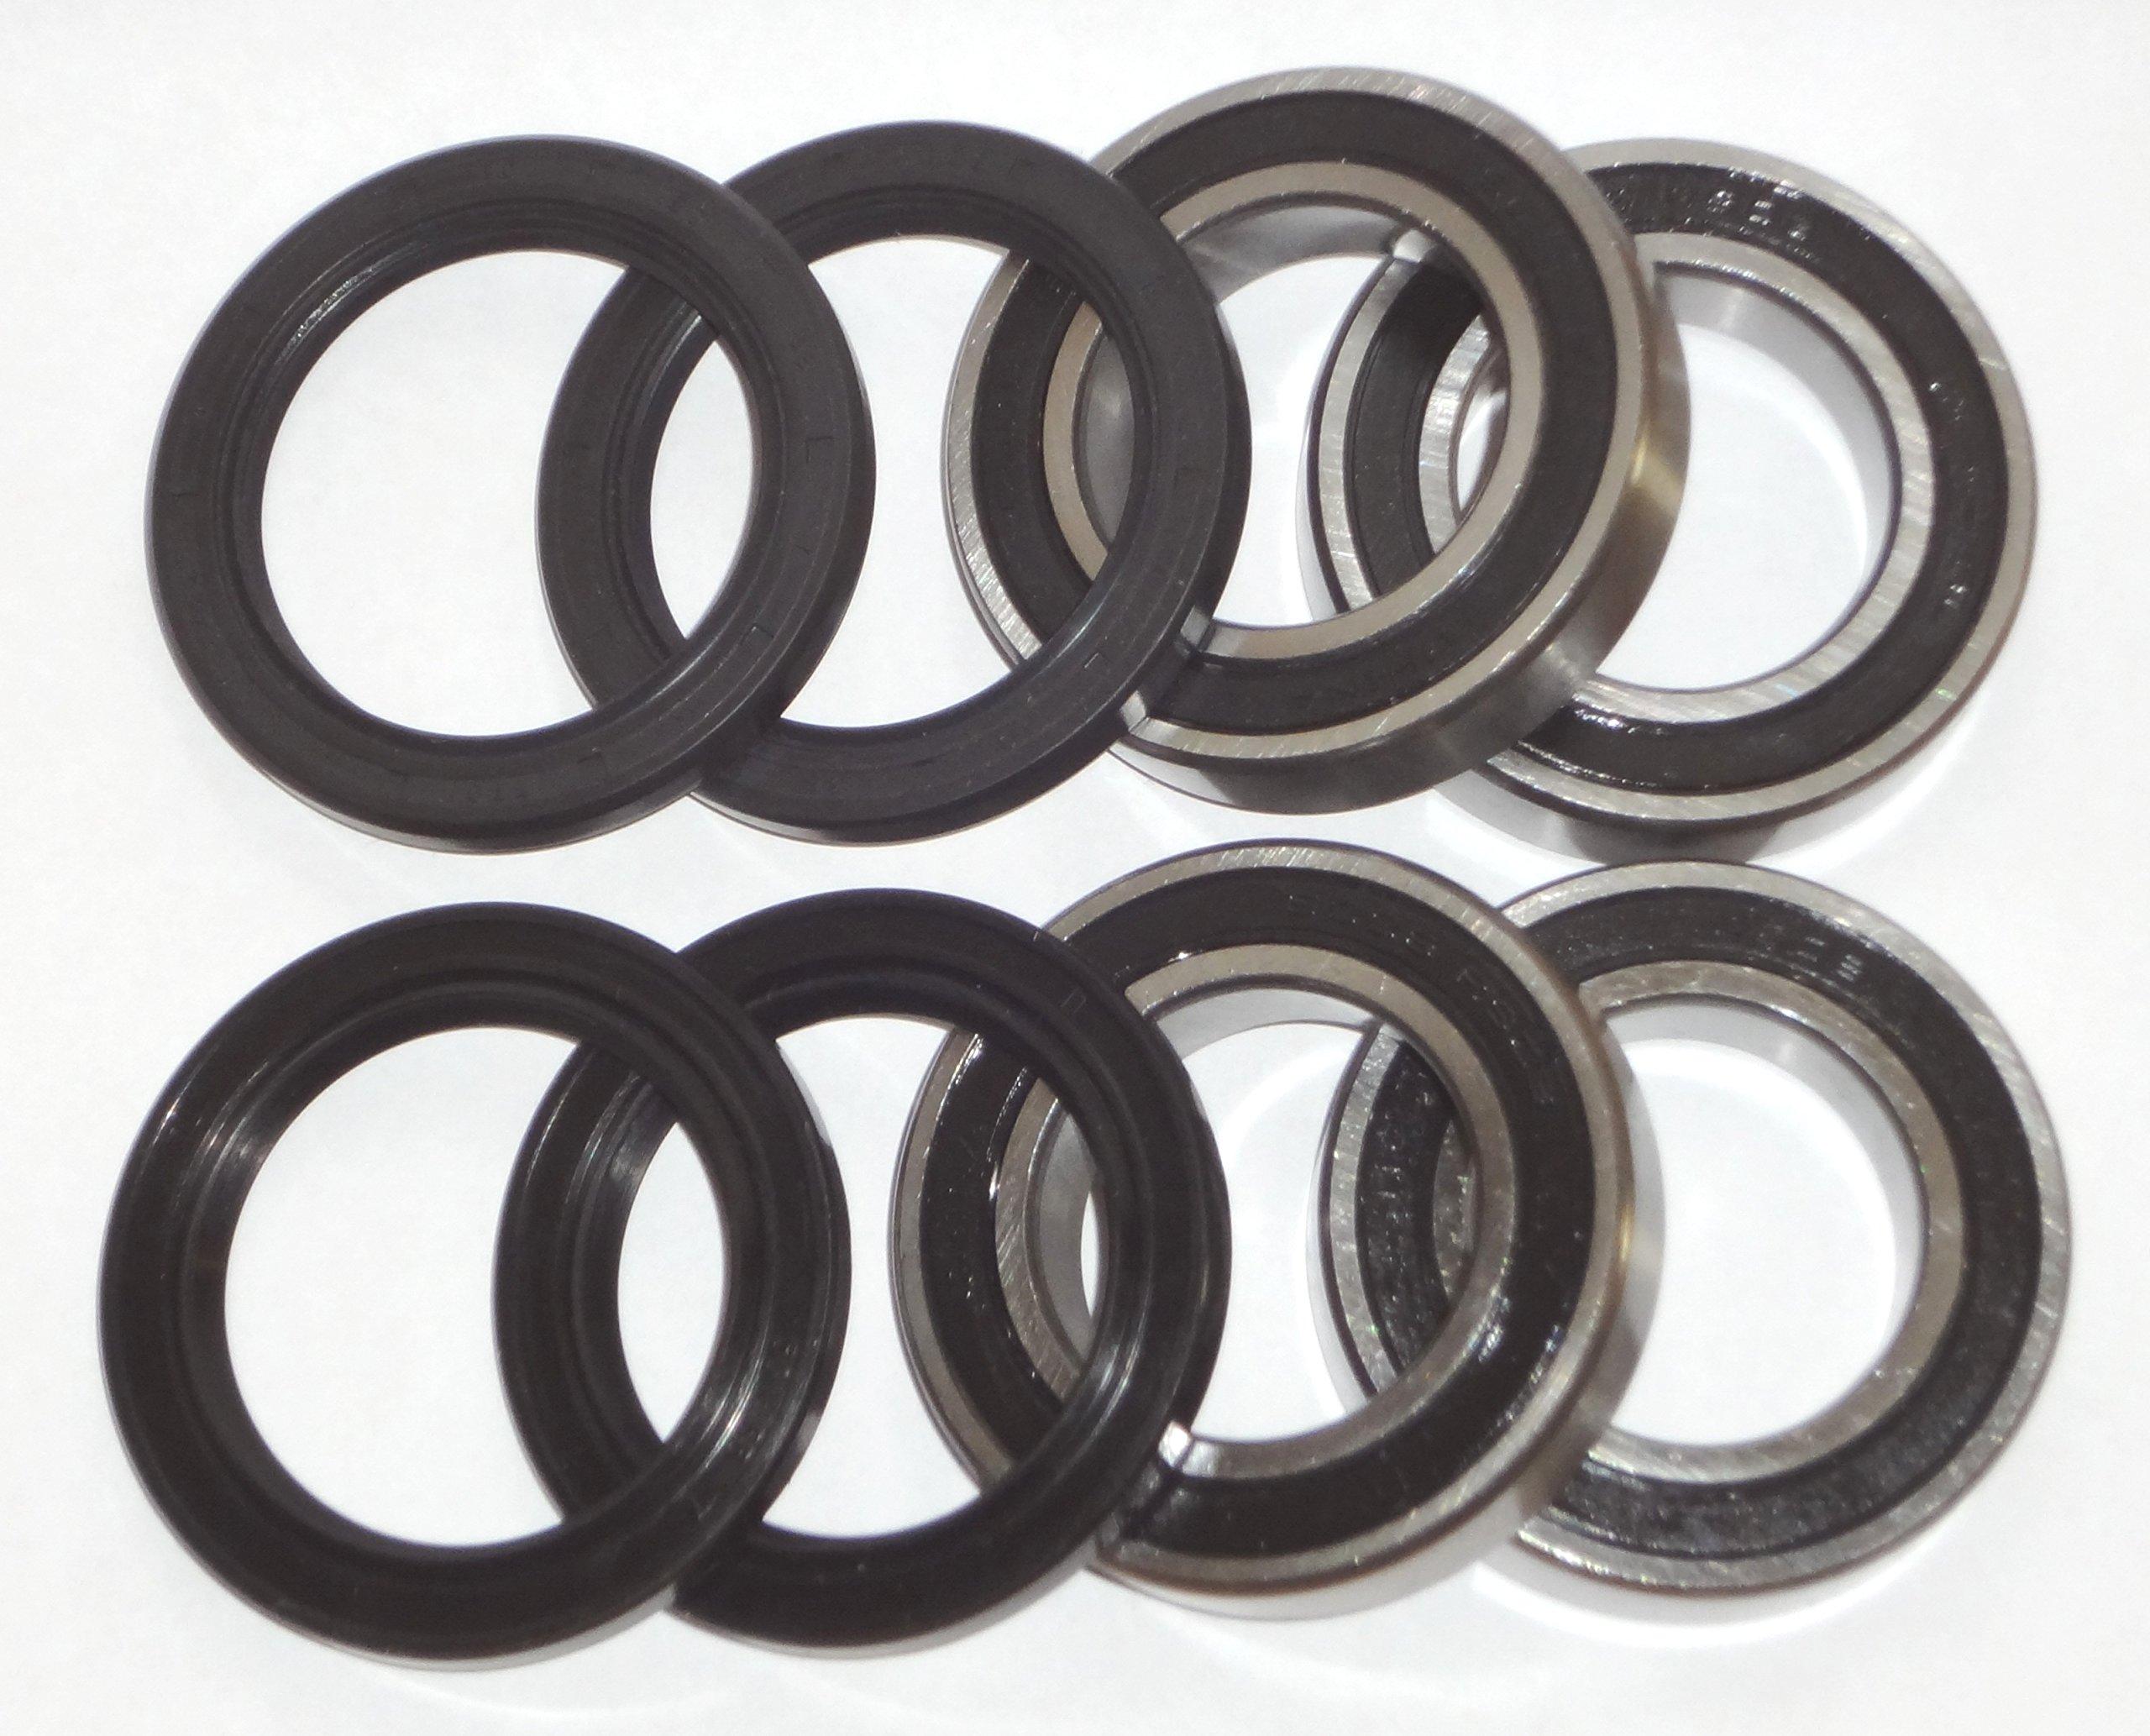 Both Honda TRX300 300 Fourtrax 2wd Front Wheel Bearings Seals 1993 - 2000